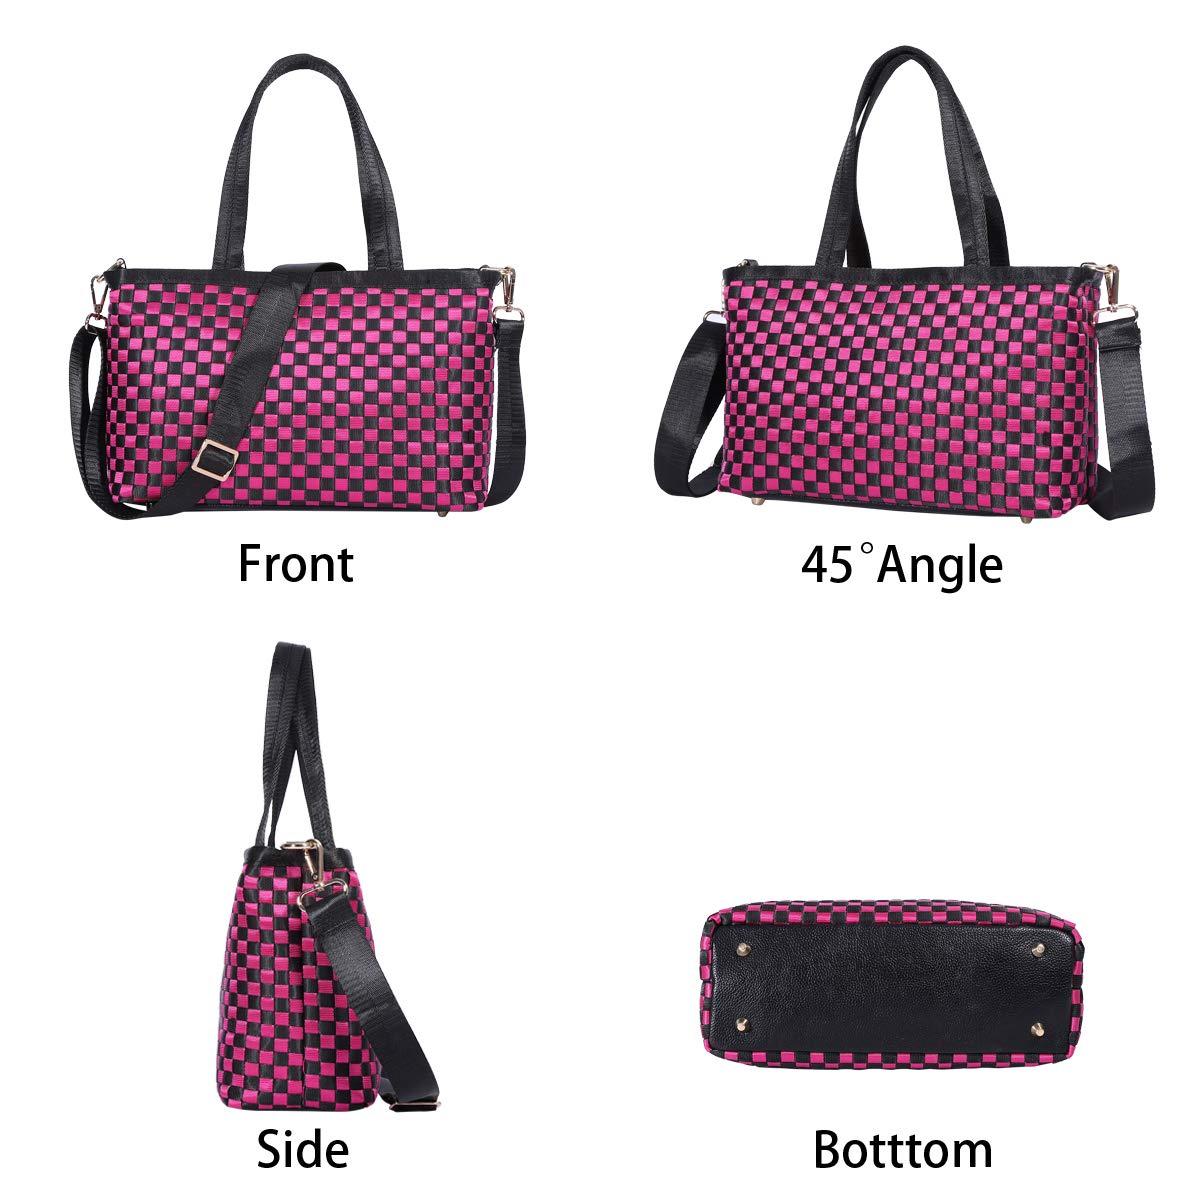 Women Handbags Nylon Shoulder Bags Top-Handle Ladies Designer Satchel Tote Bags Purse